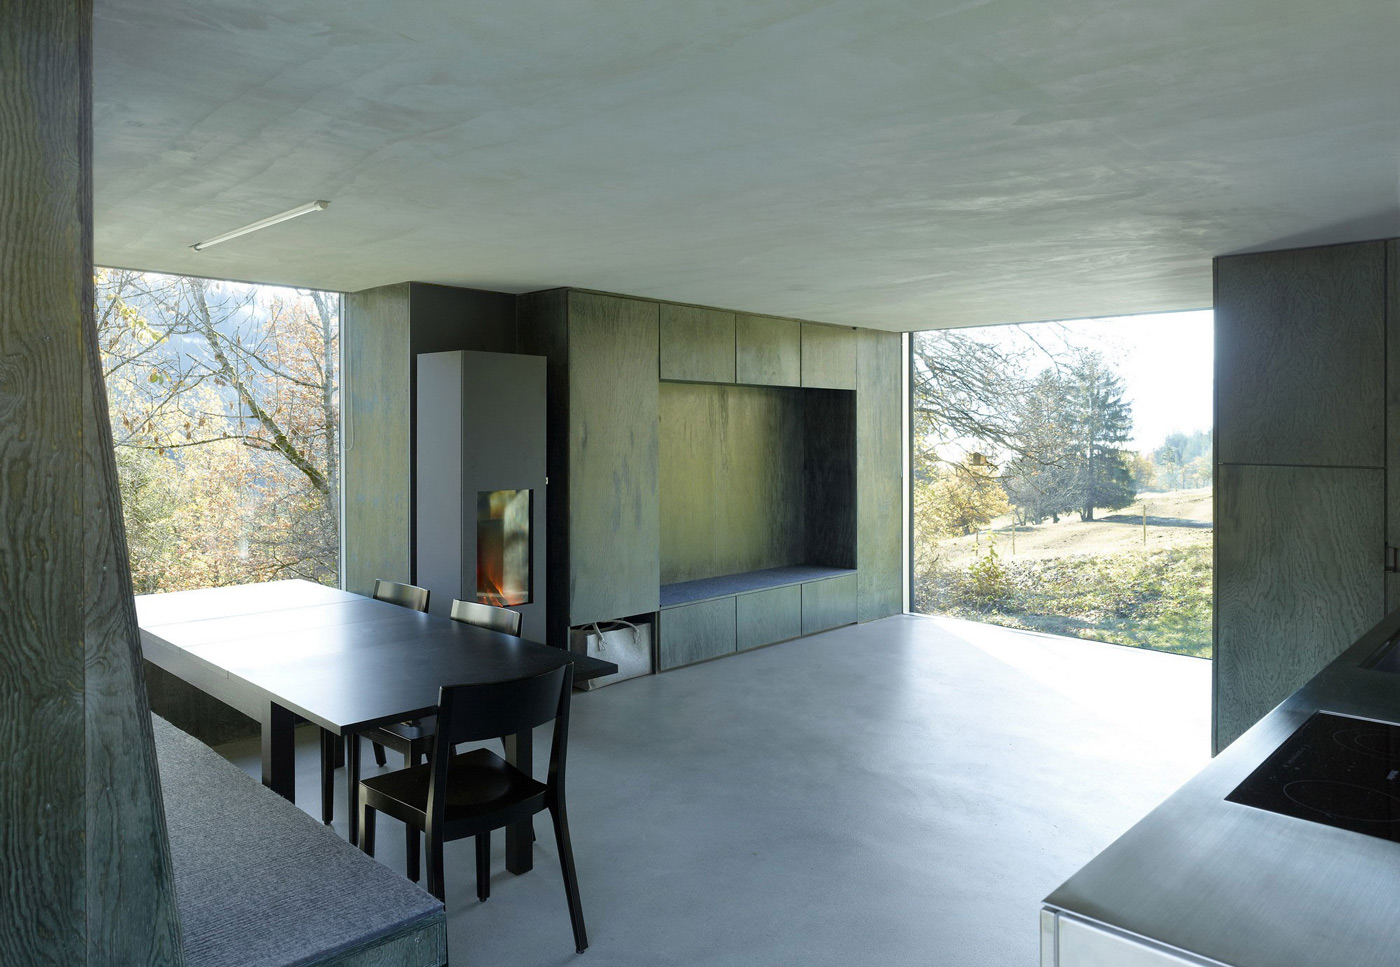 Open Plan Living, Large Windows, Holiday Home Renovation in Ayent, Switzerland